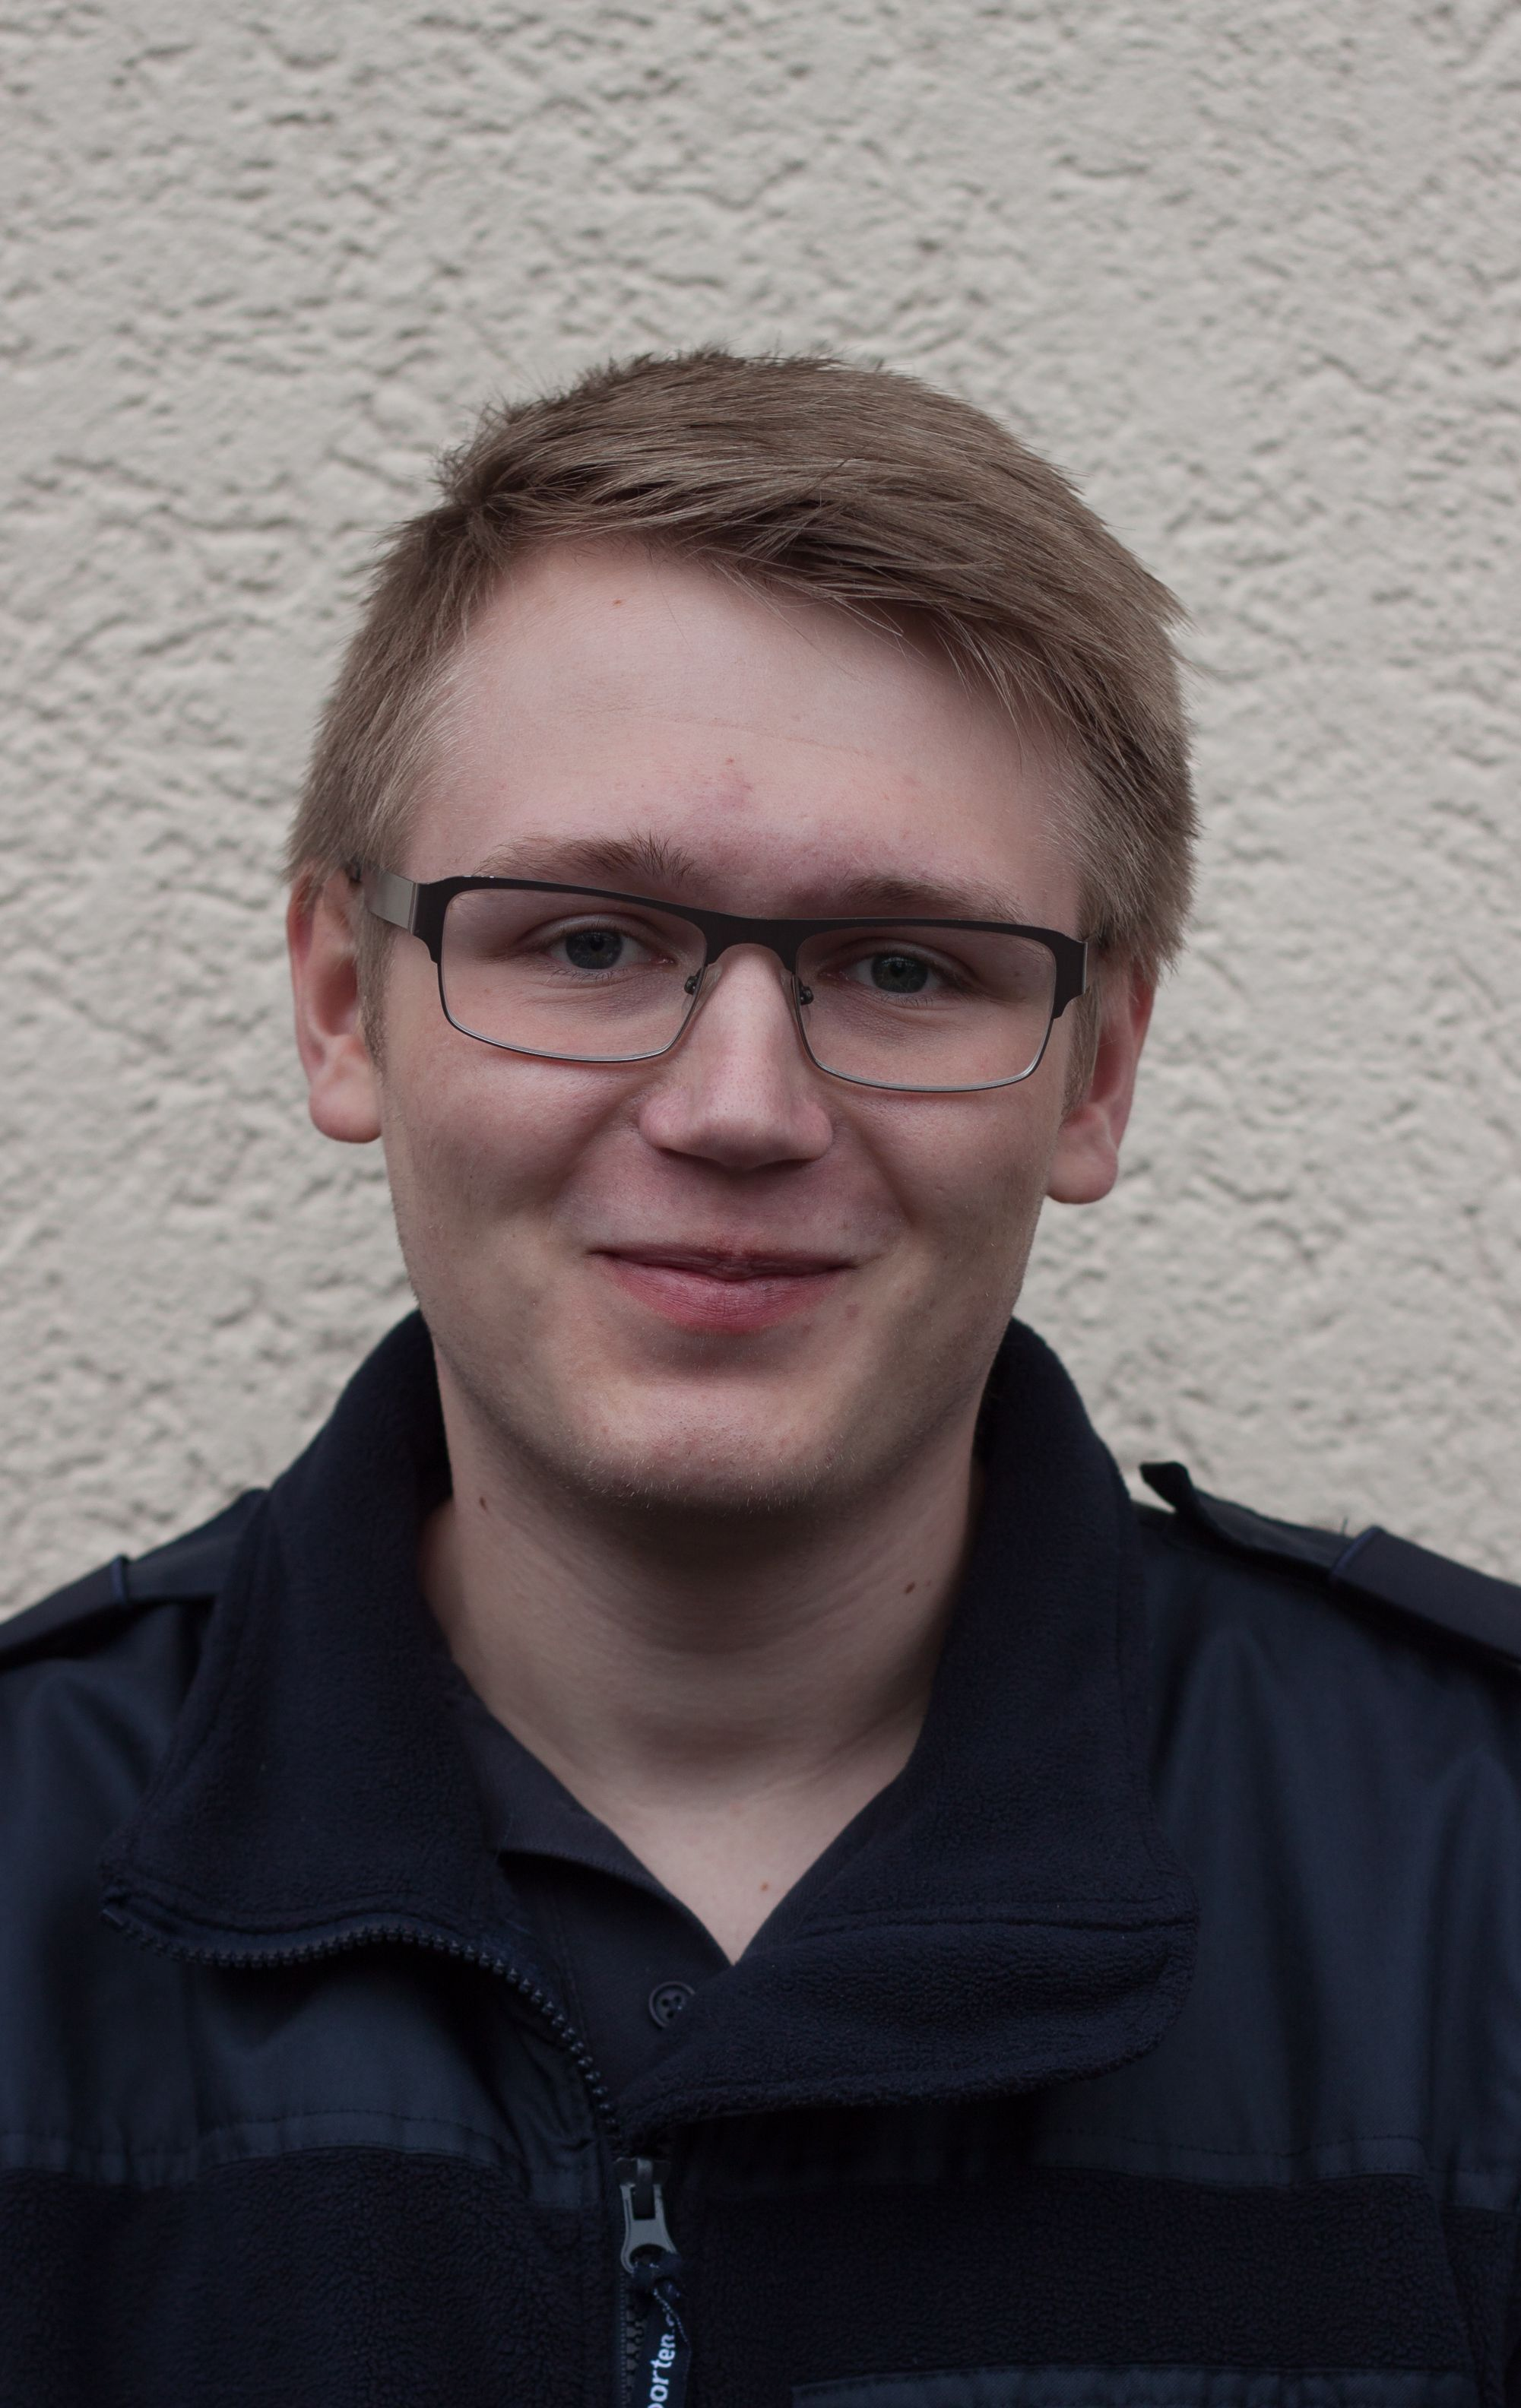 Viktor Tschischewski